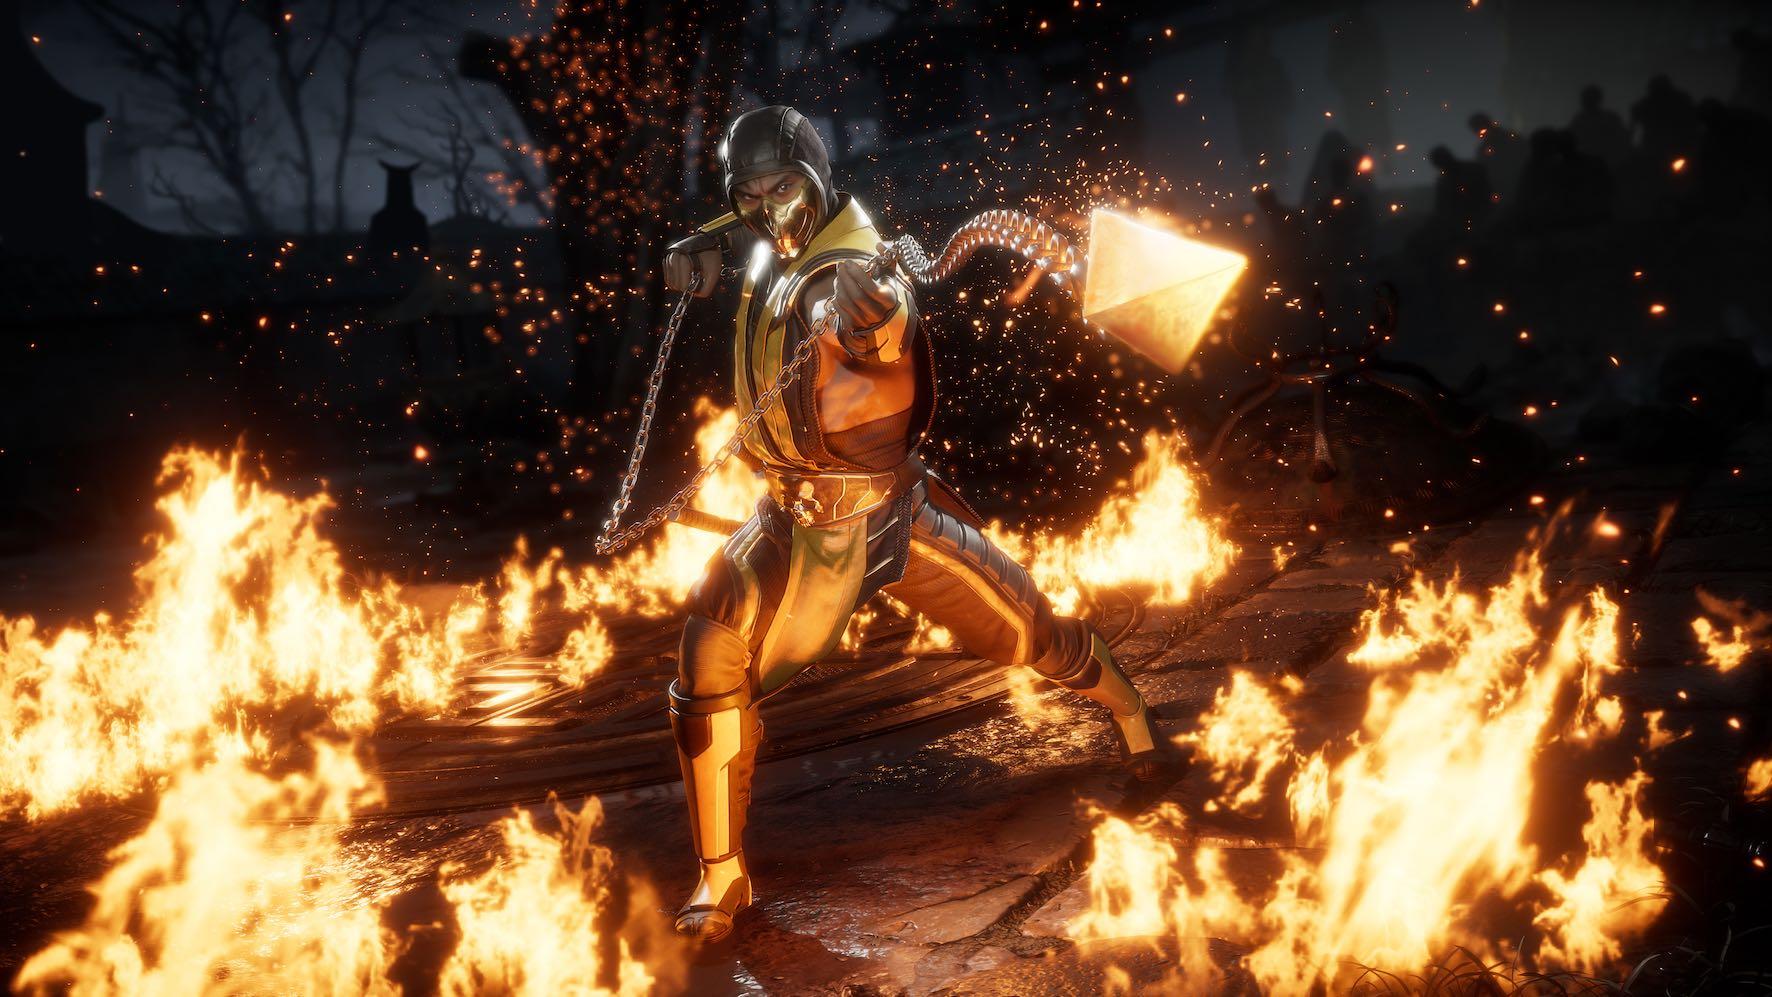 Scorpion featured in Mortal Kombat 11